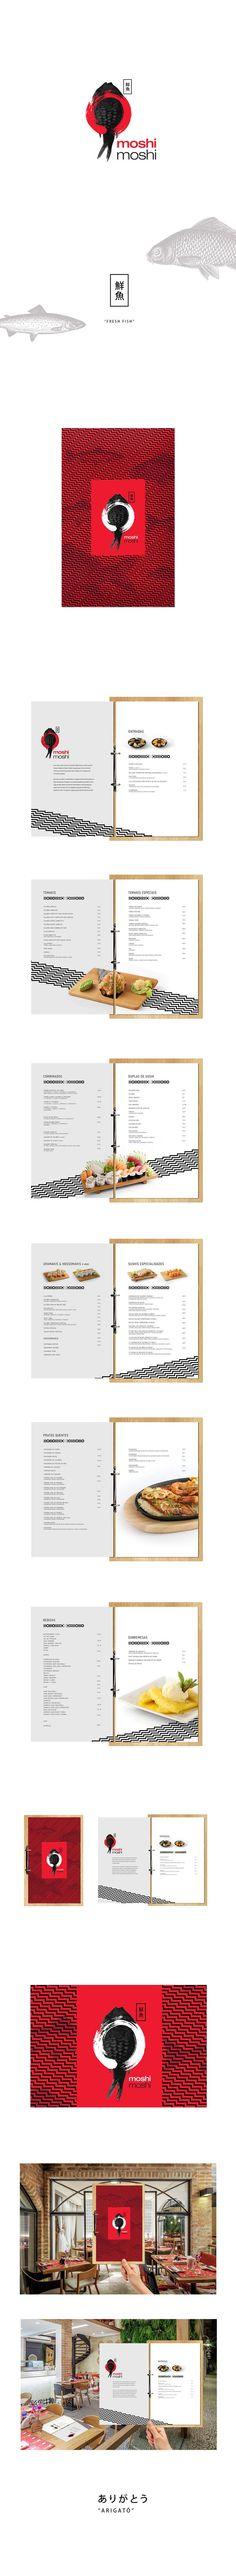 Moshi Moshi Japanese Restaurant Menu on Behance: